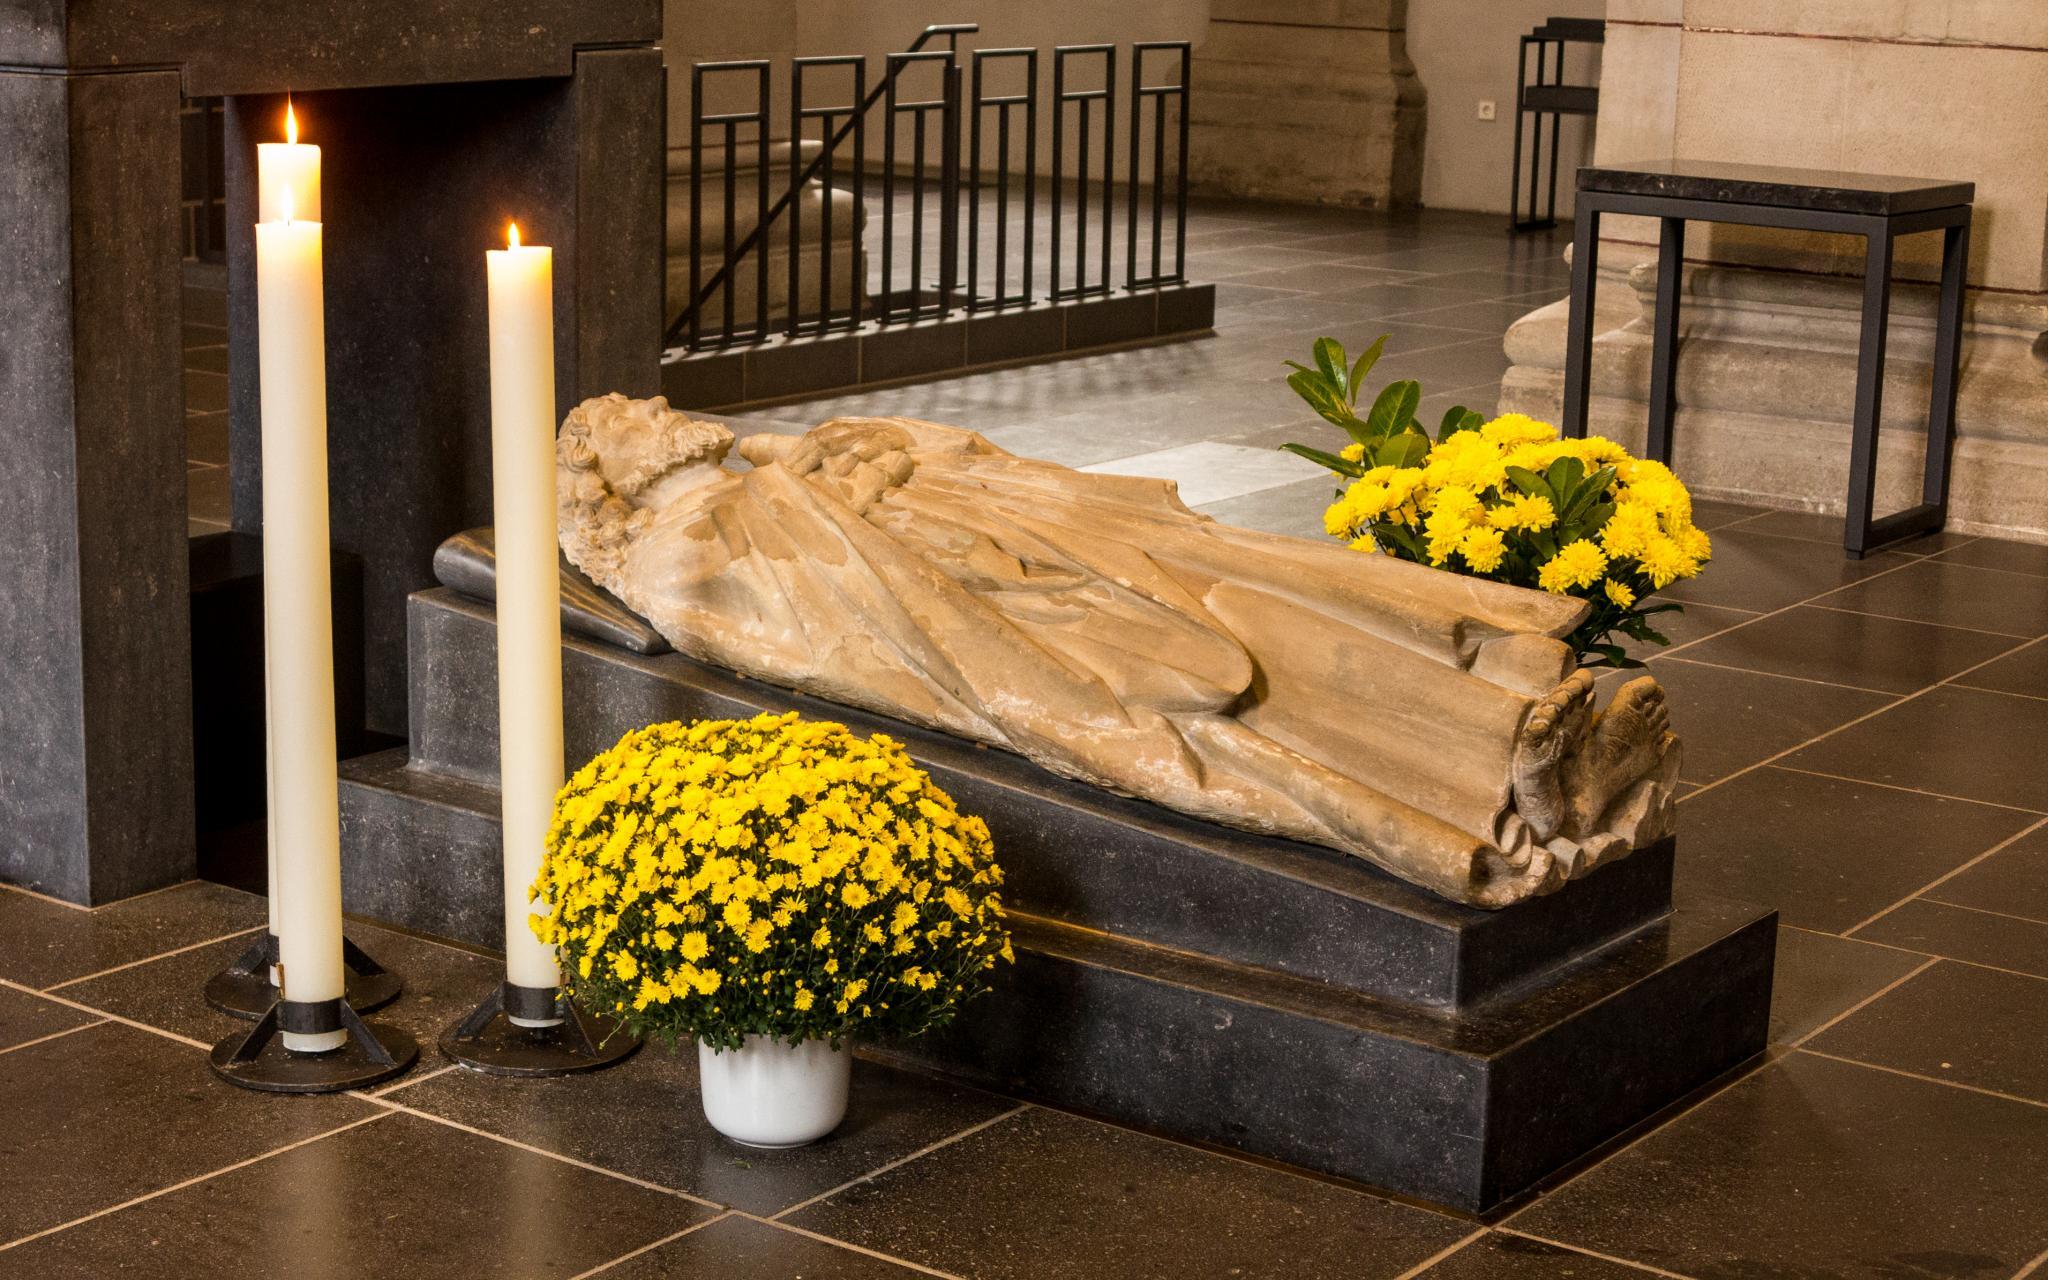 Jakobsweg Trier: St. Matthias Altar Statue